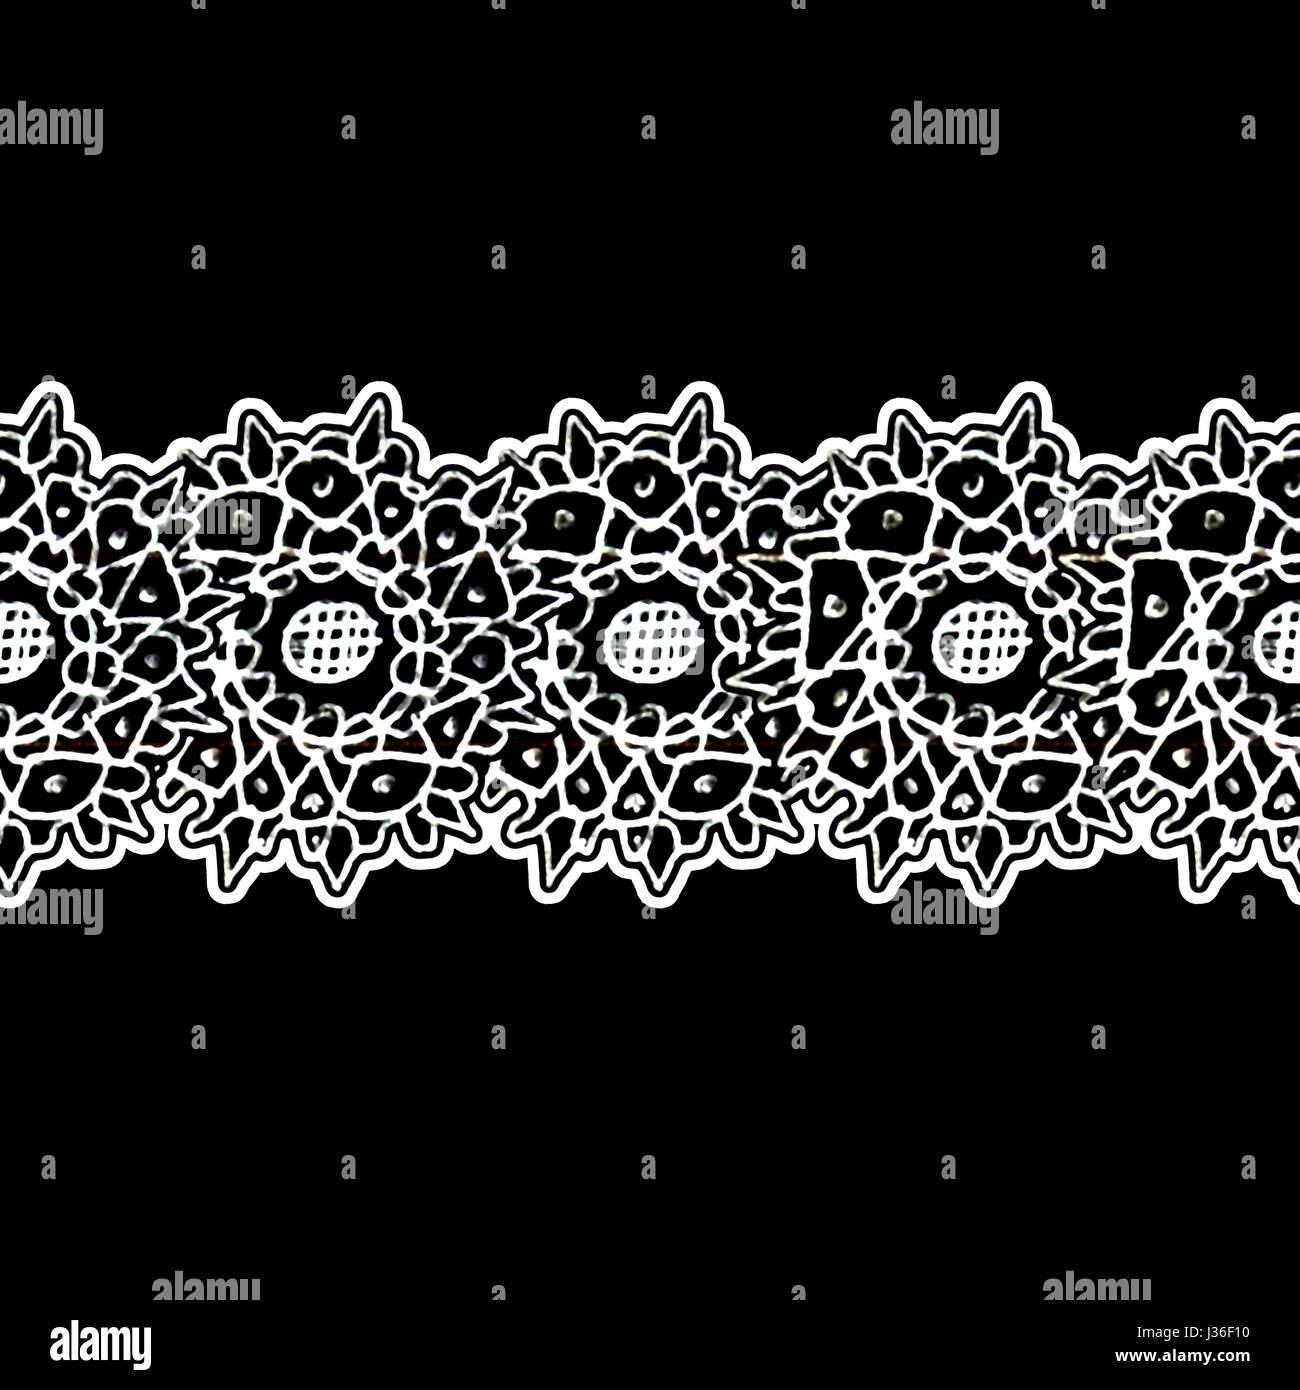 Mixed media technique stars motif hand draw graphic stripe ornate design in black and white colors Stock Photo